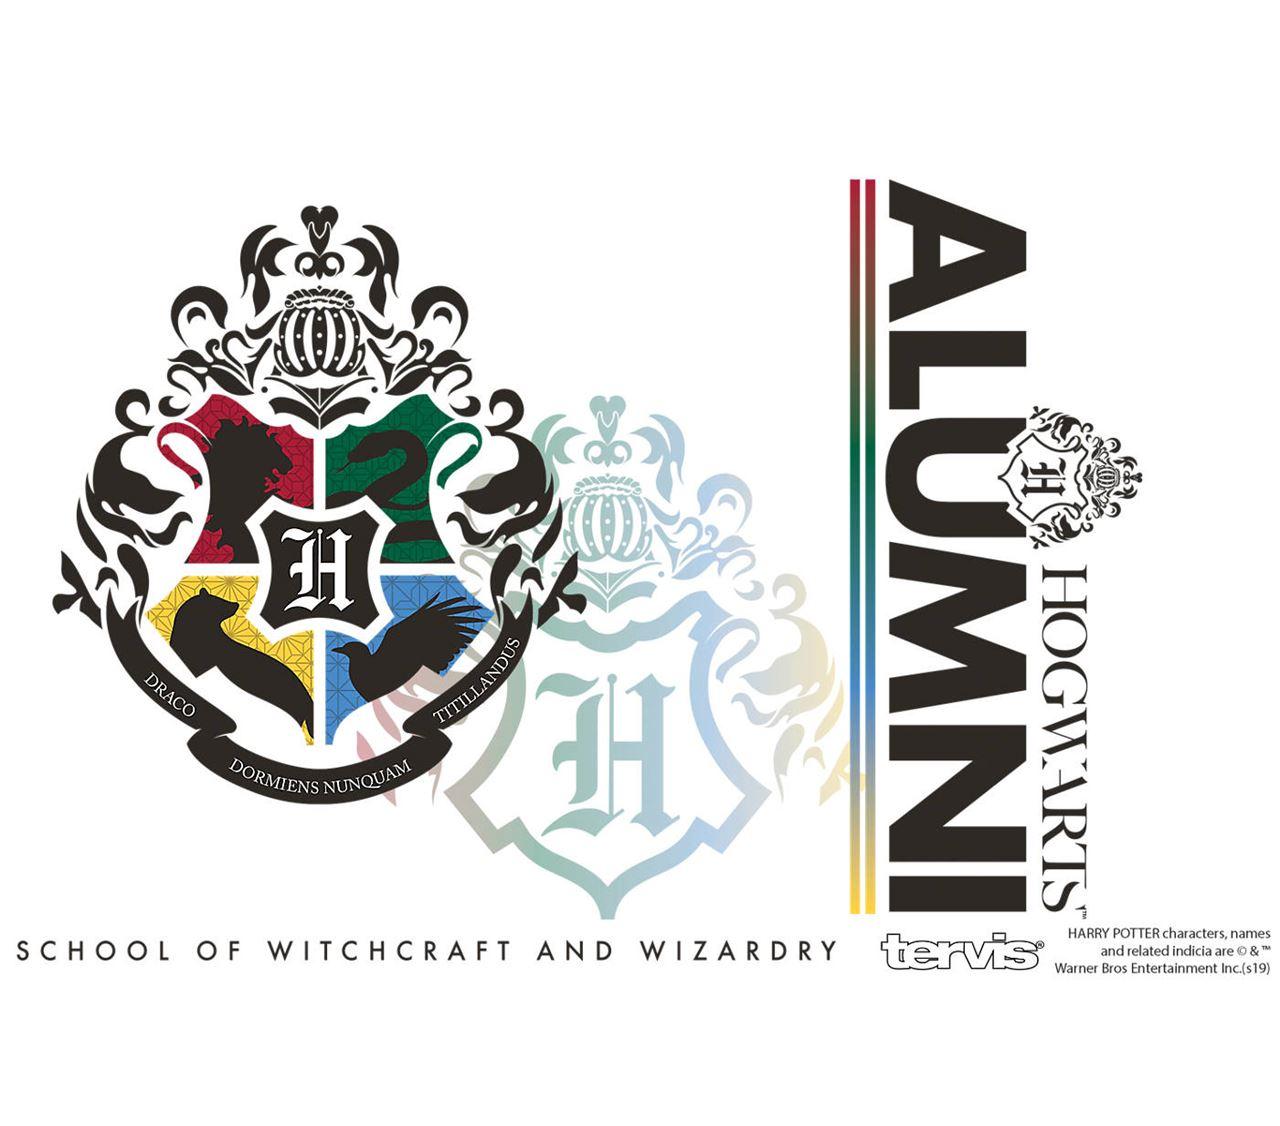 Harry Potter Hogwarts Alumni 20oz. Stainless Steel Tumbler by Tervis